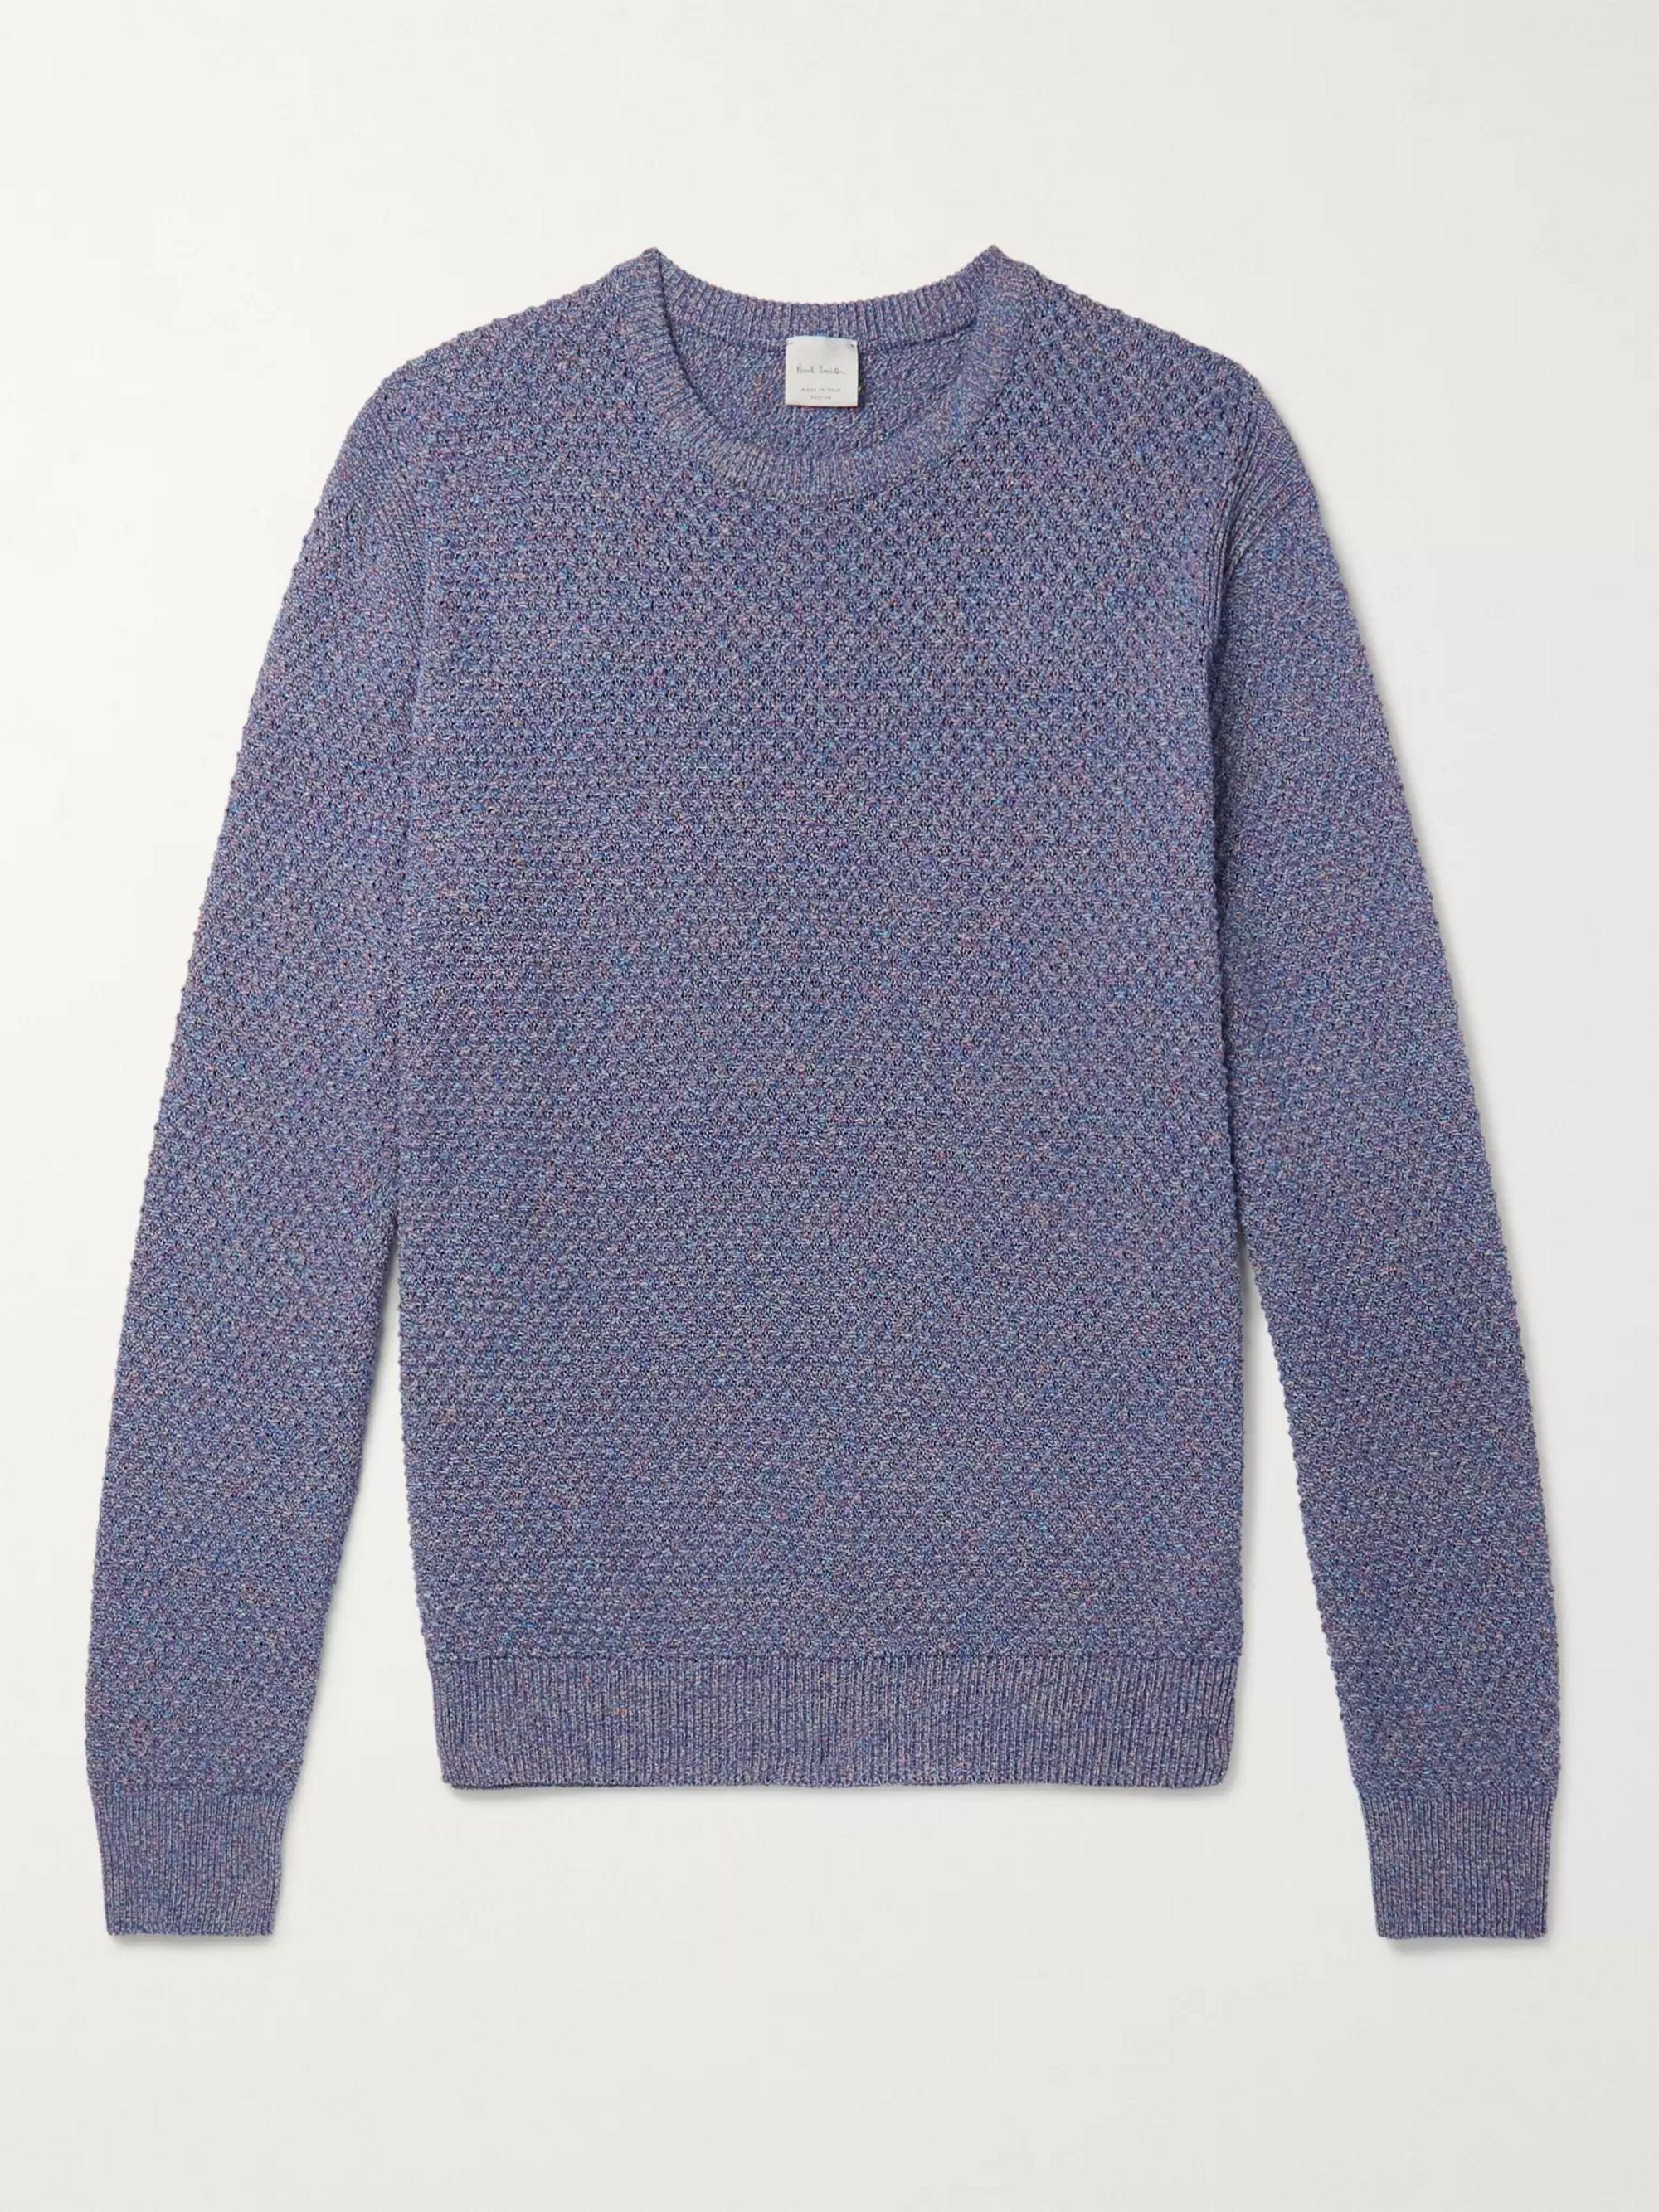 Cut Away Knitted Textured Melange Skjorte